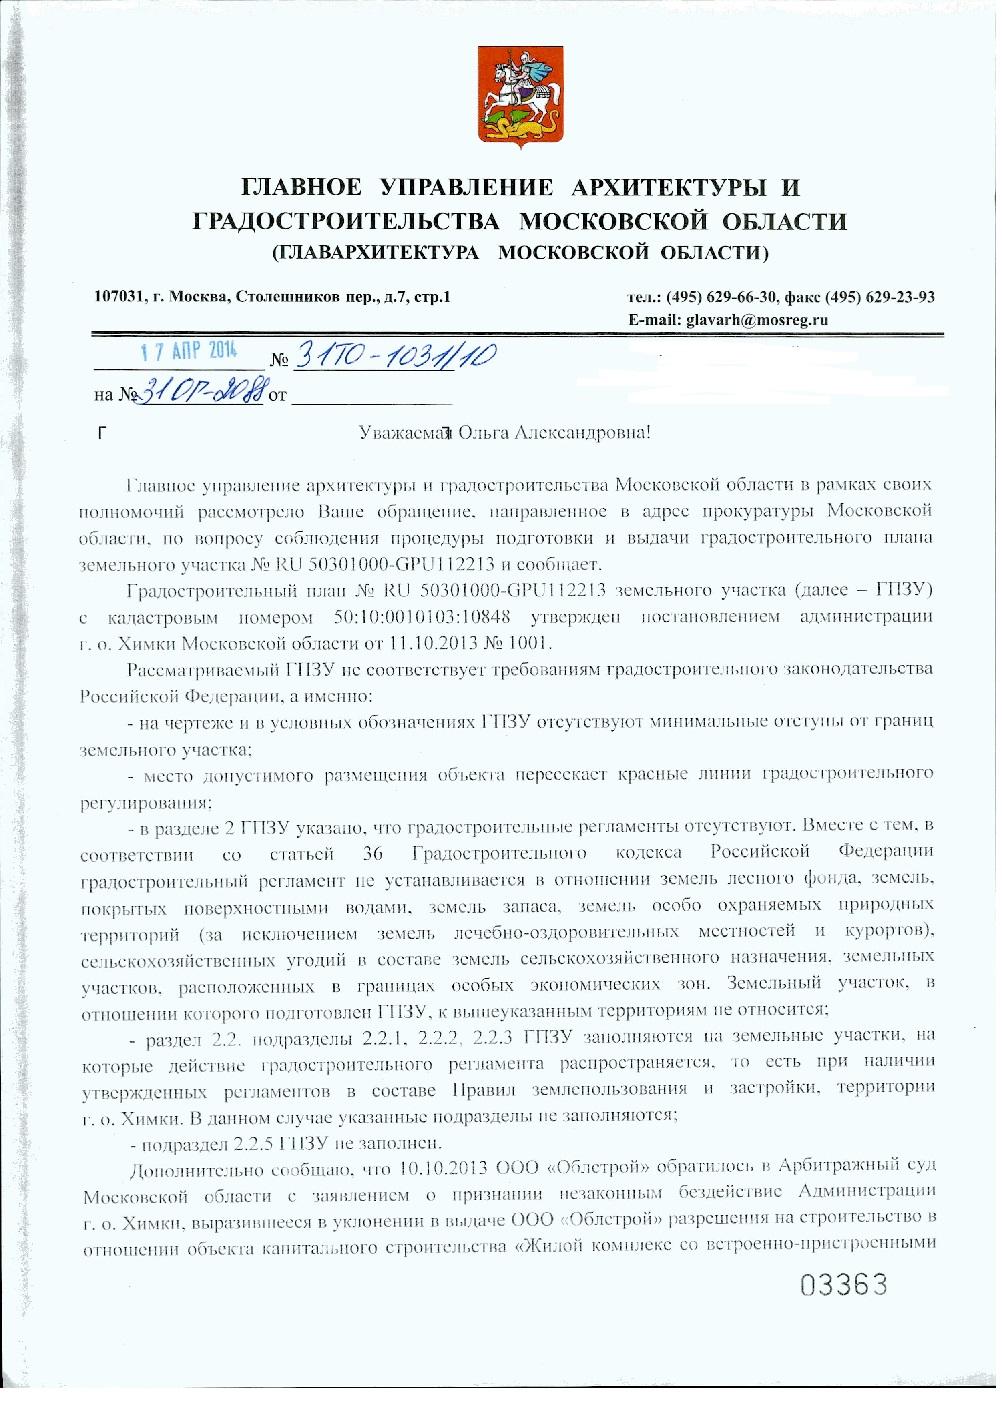 04-2014-Главарх1